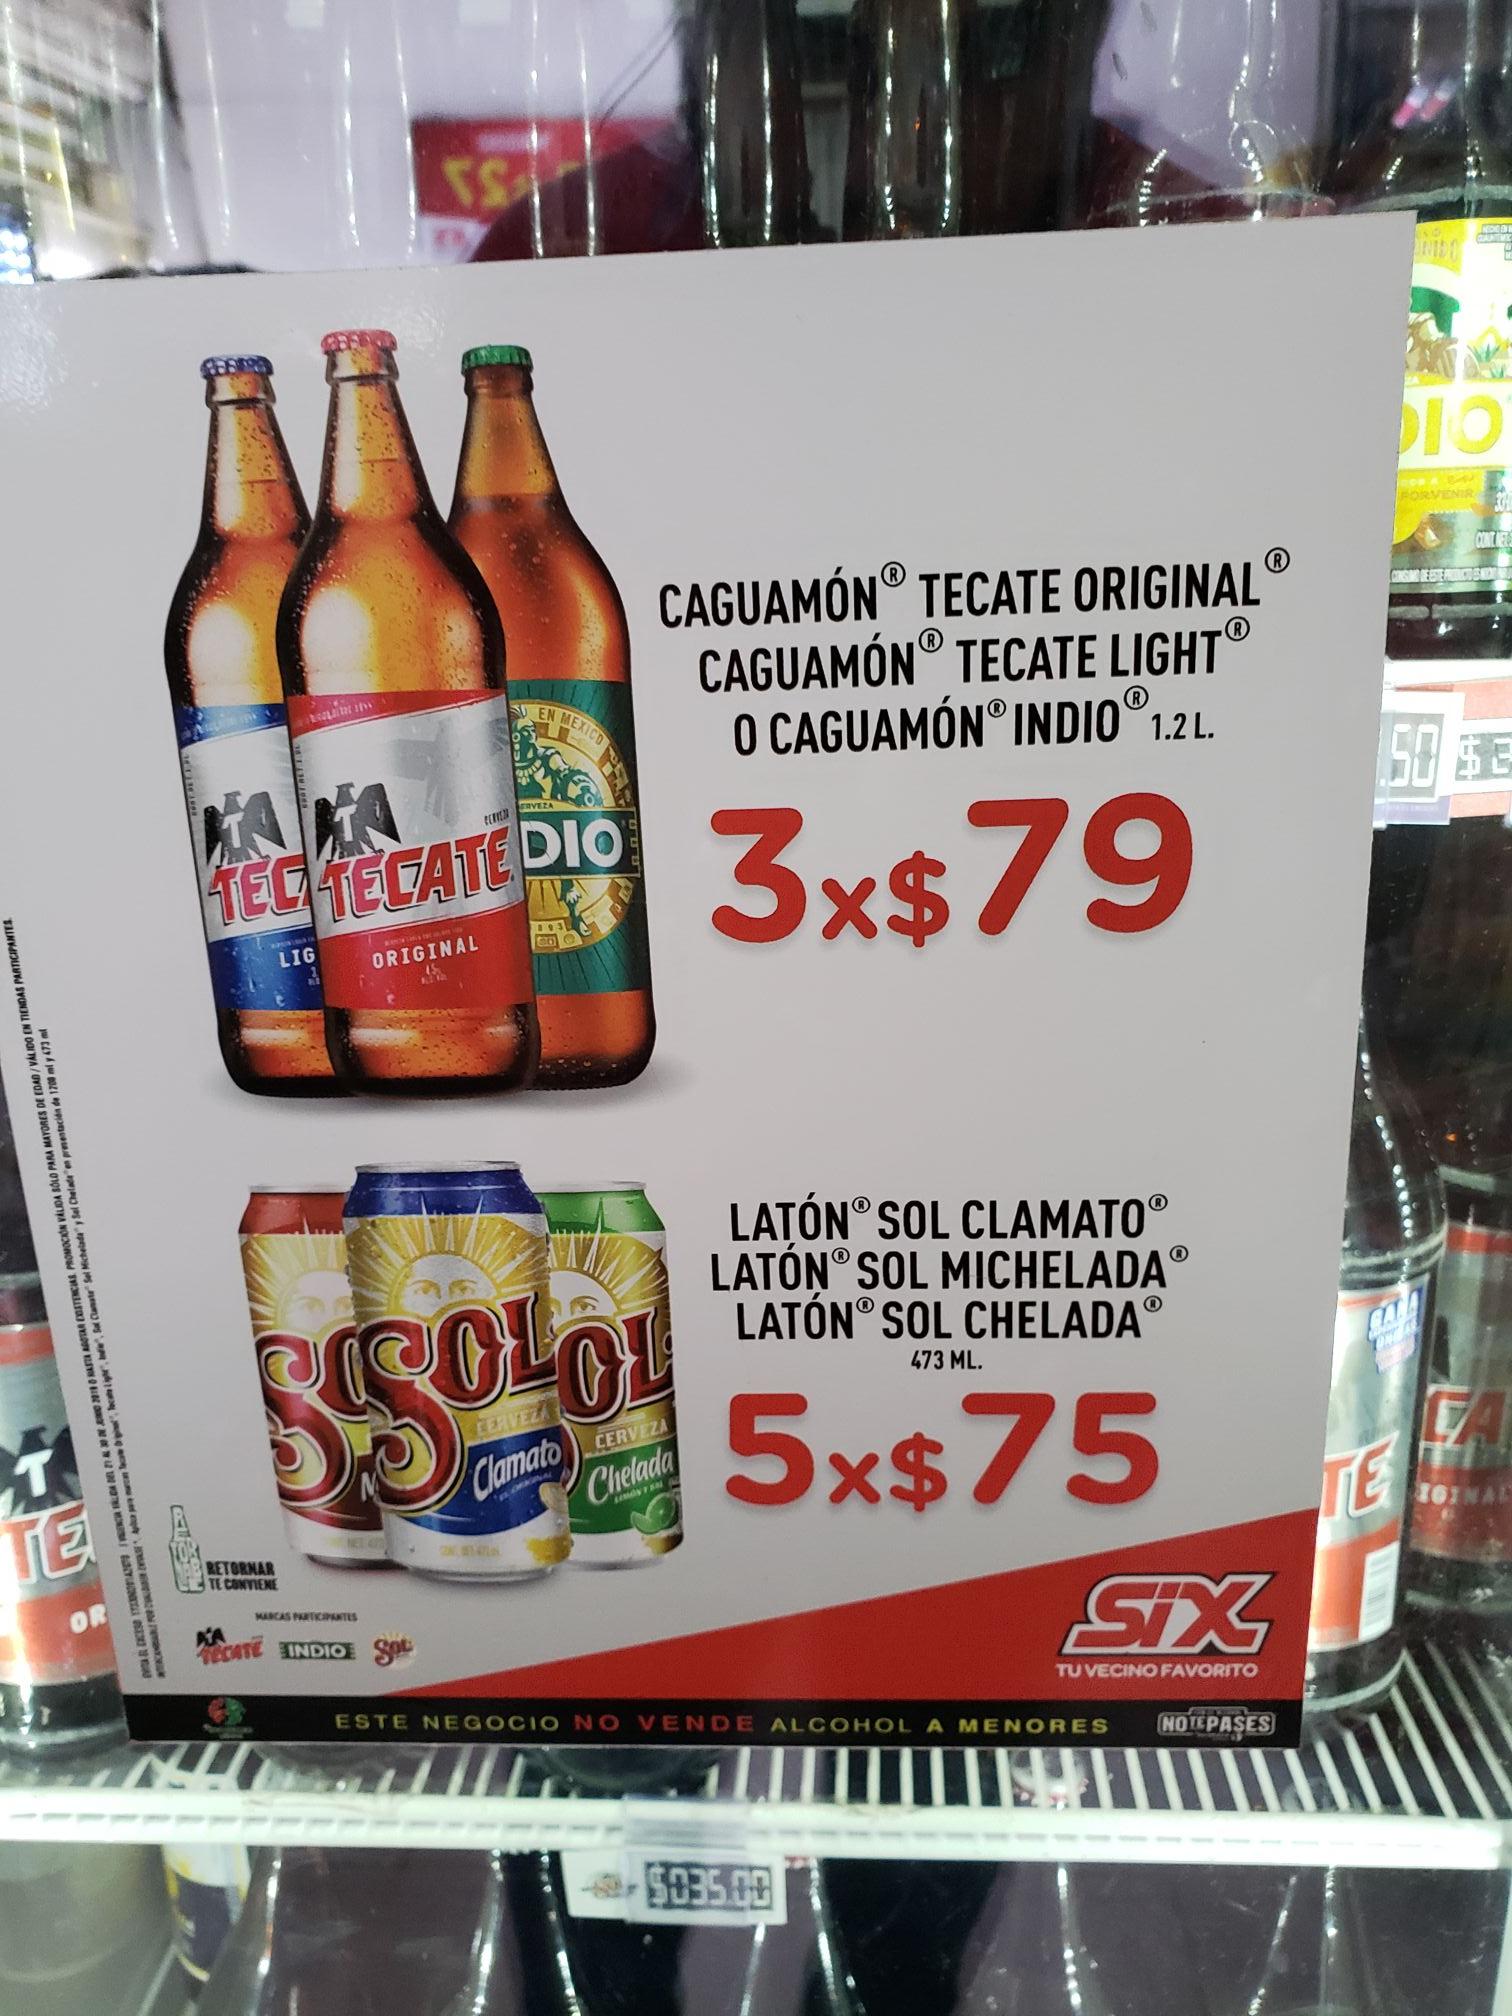 SIX: 5 cervezas sol de sabores